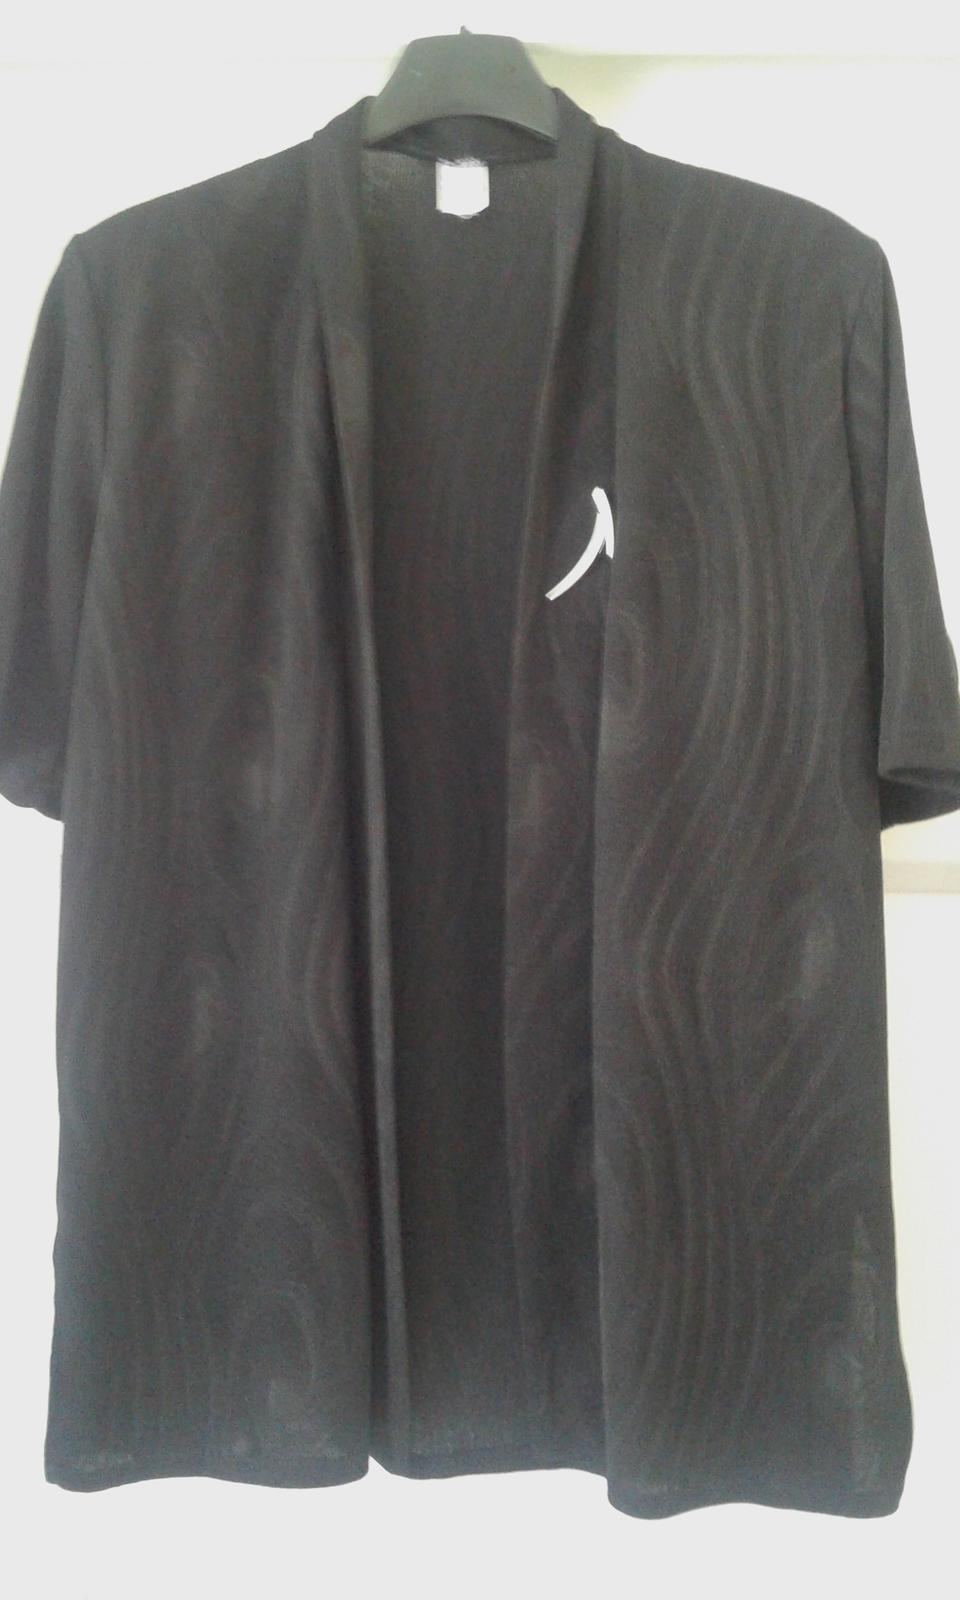 Čierny kostým - kabátik, top a sukňa č.L - Obrázok č. 1